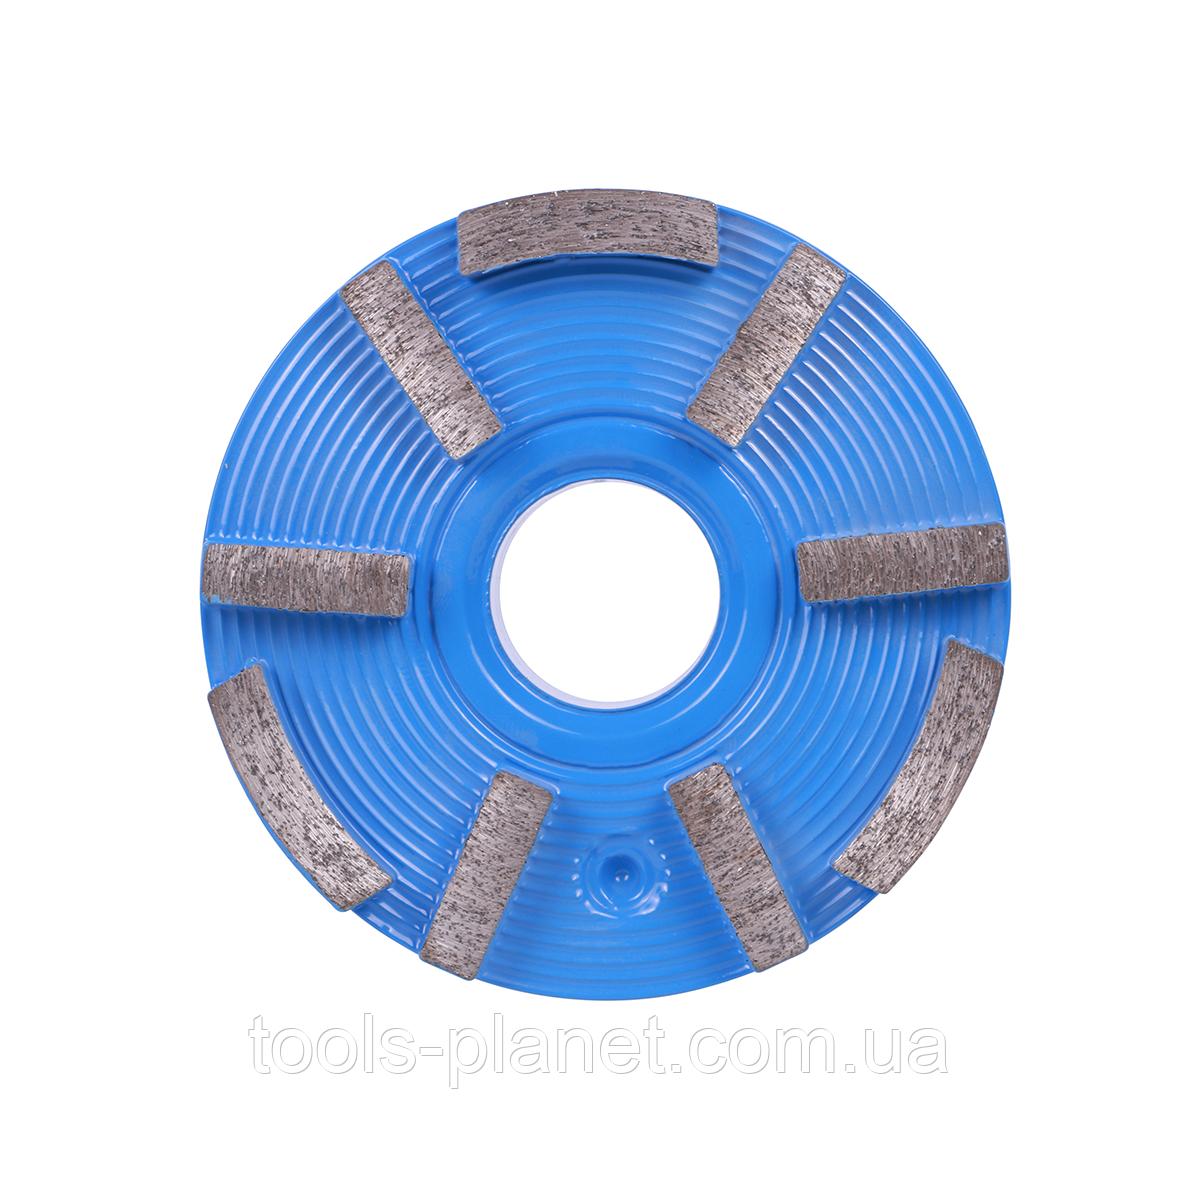 Алмазная фреза по бетону Distar ФАТС-W 95 МШМ-12 №00 (16923097004)